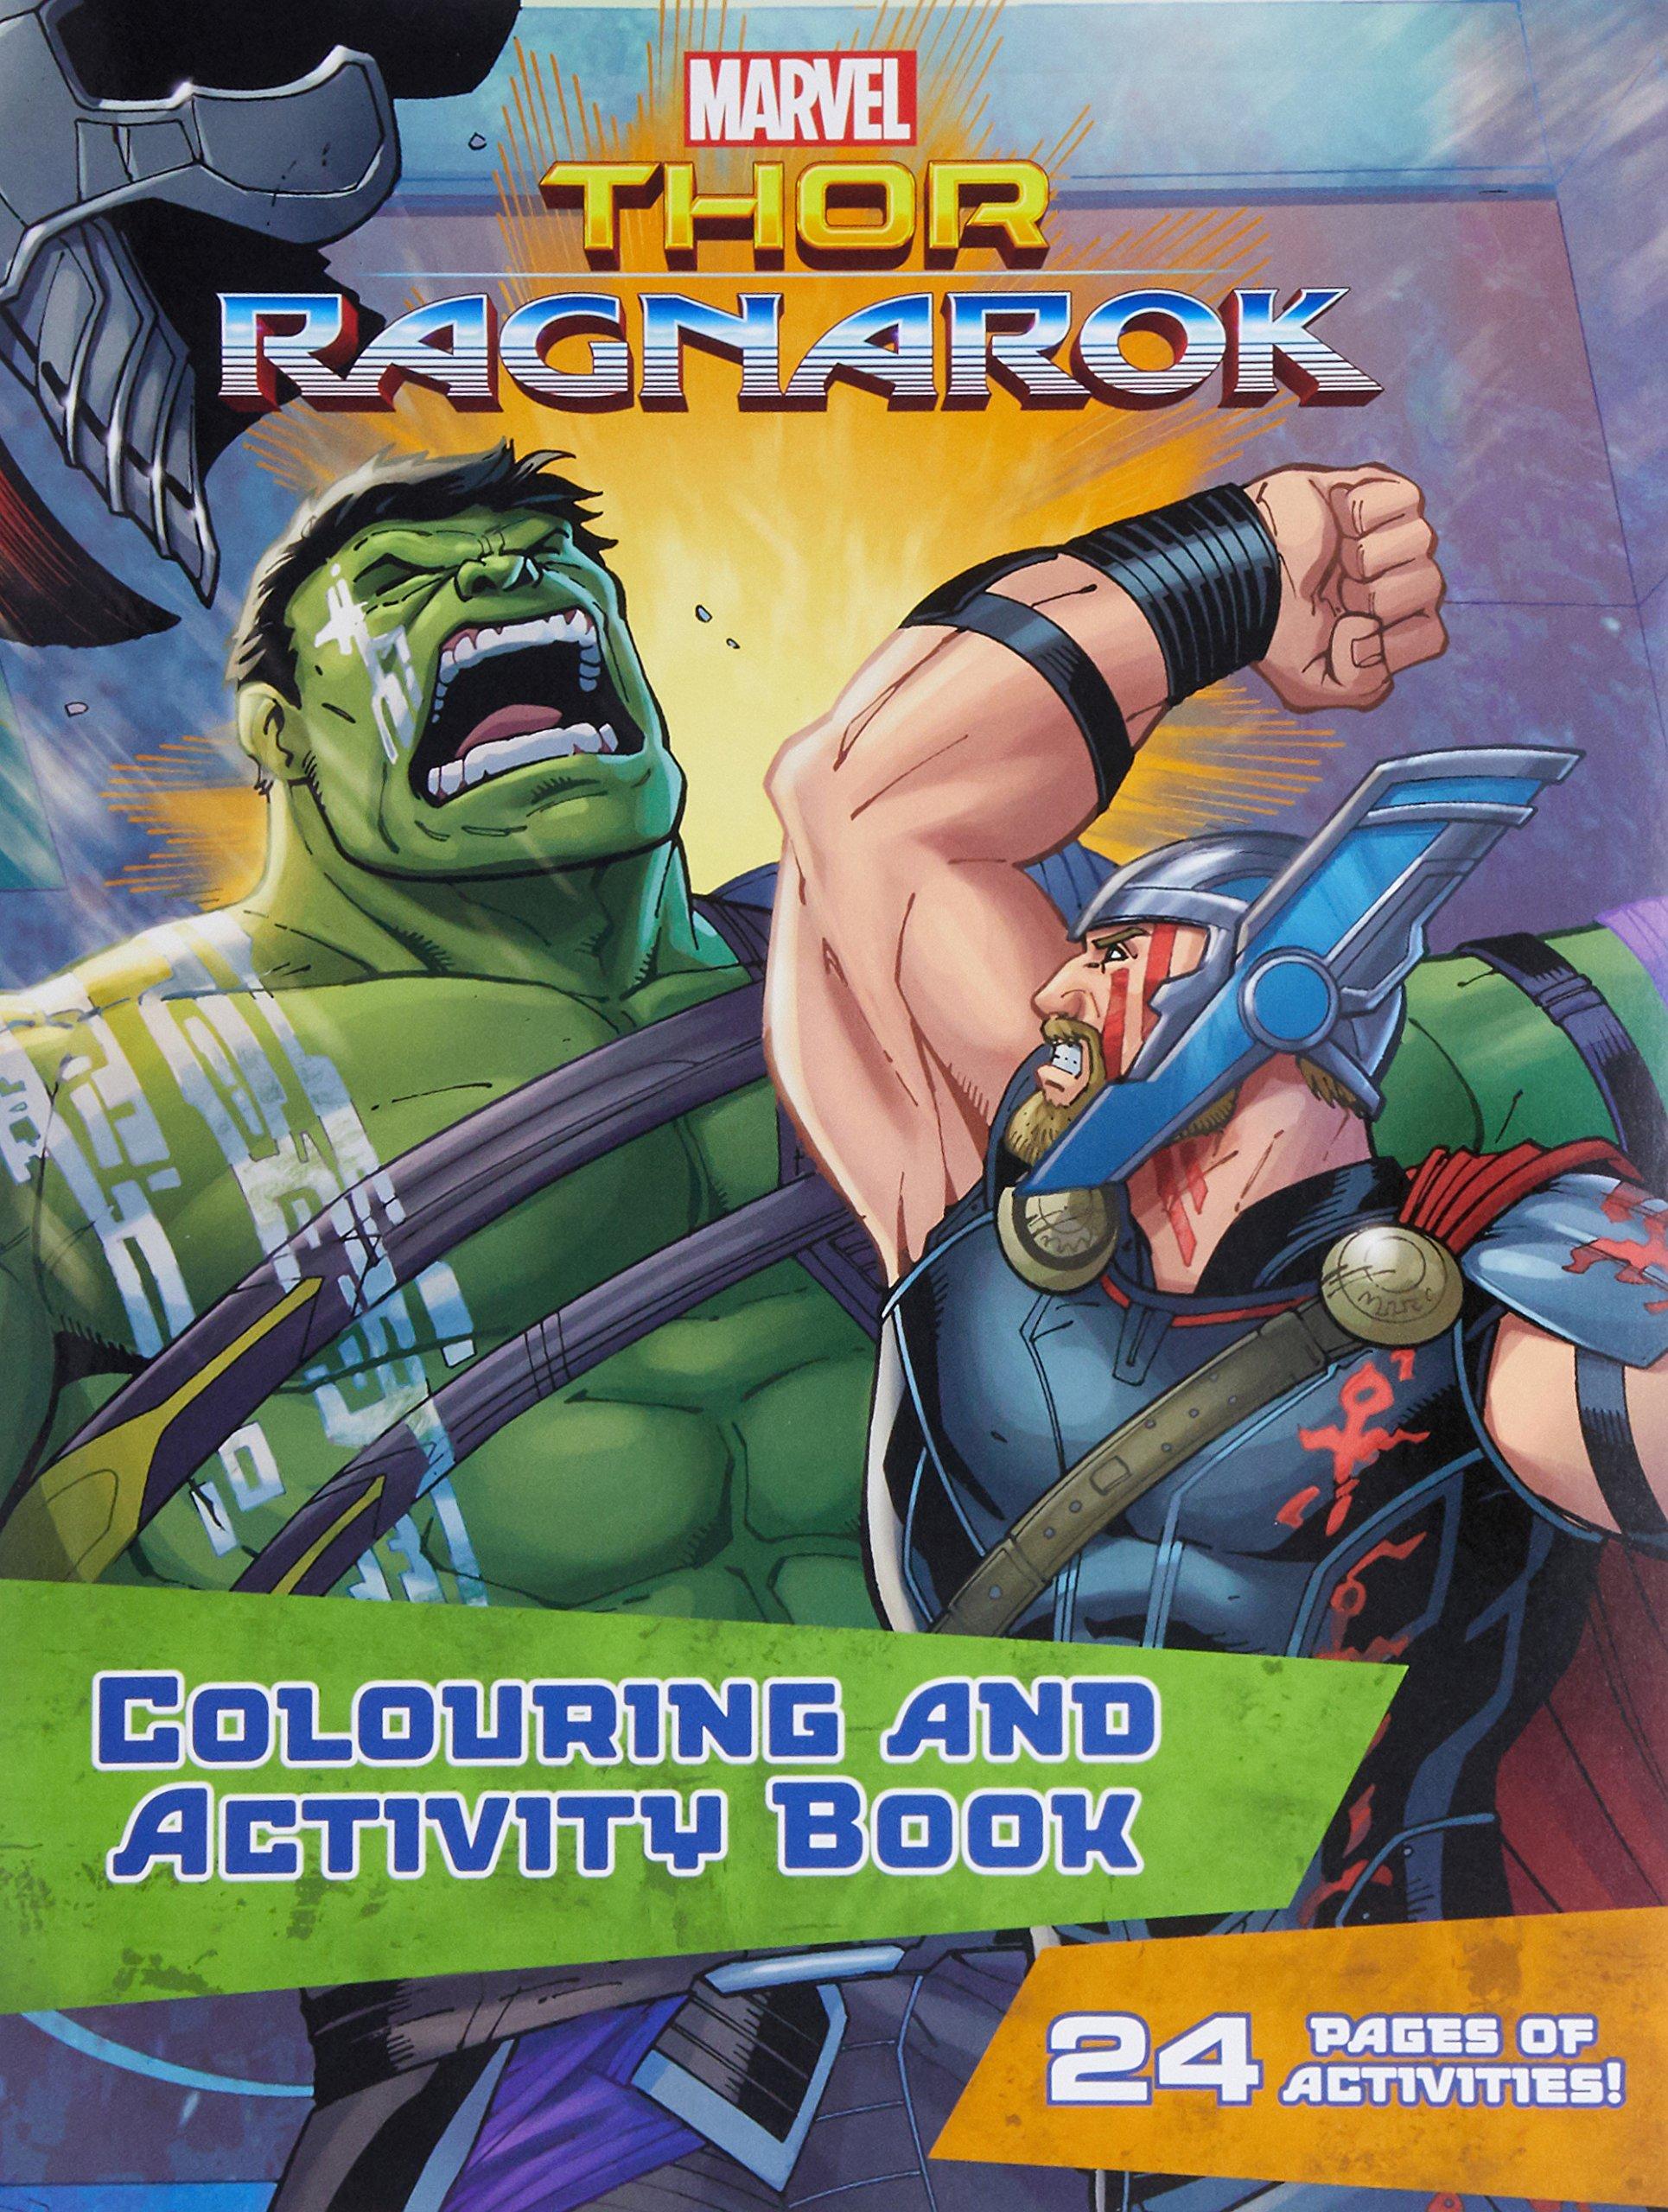 Marvel Thor Ragnarok Colouring Activity Book